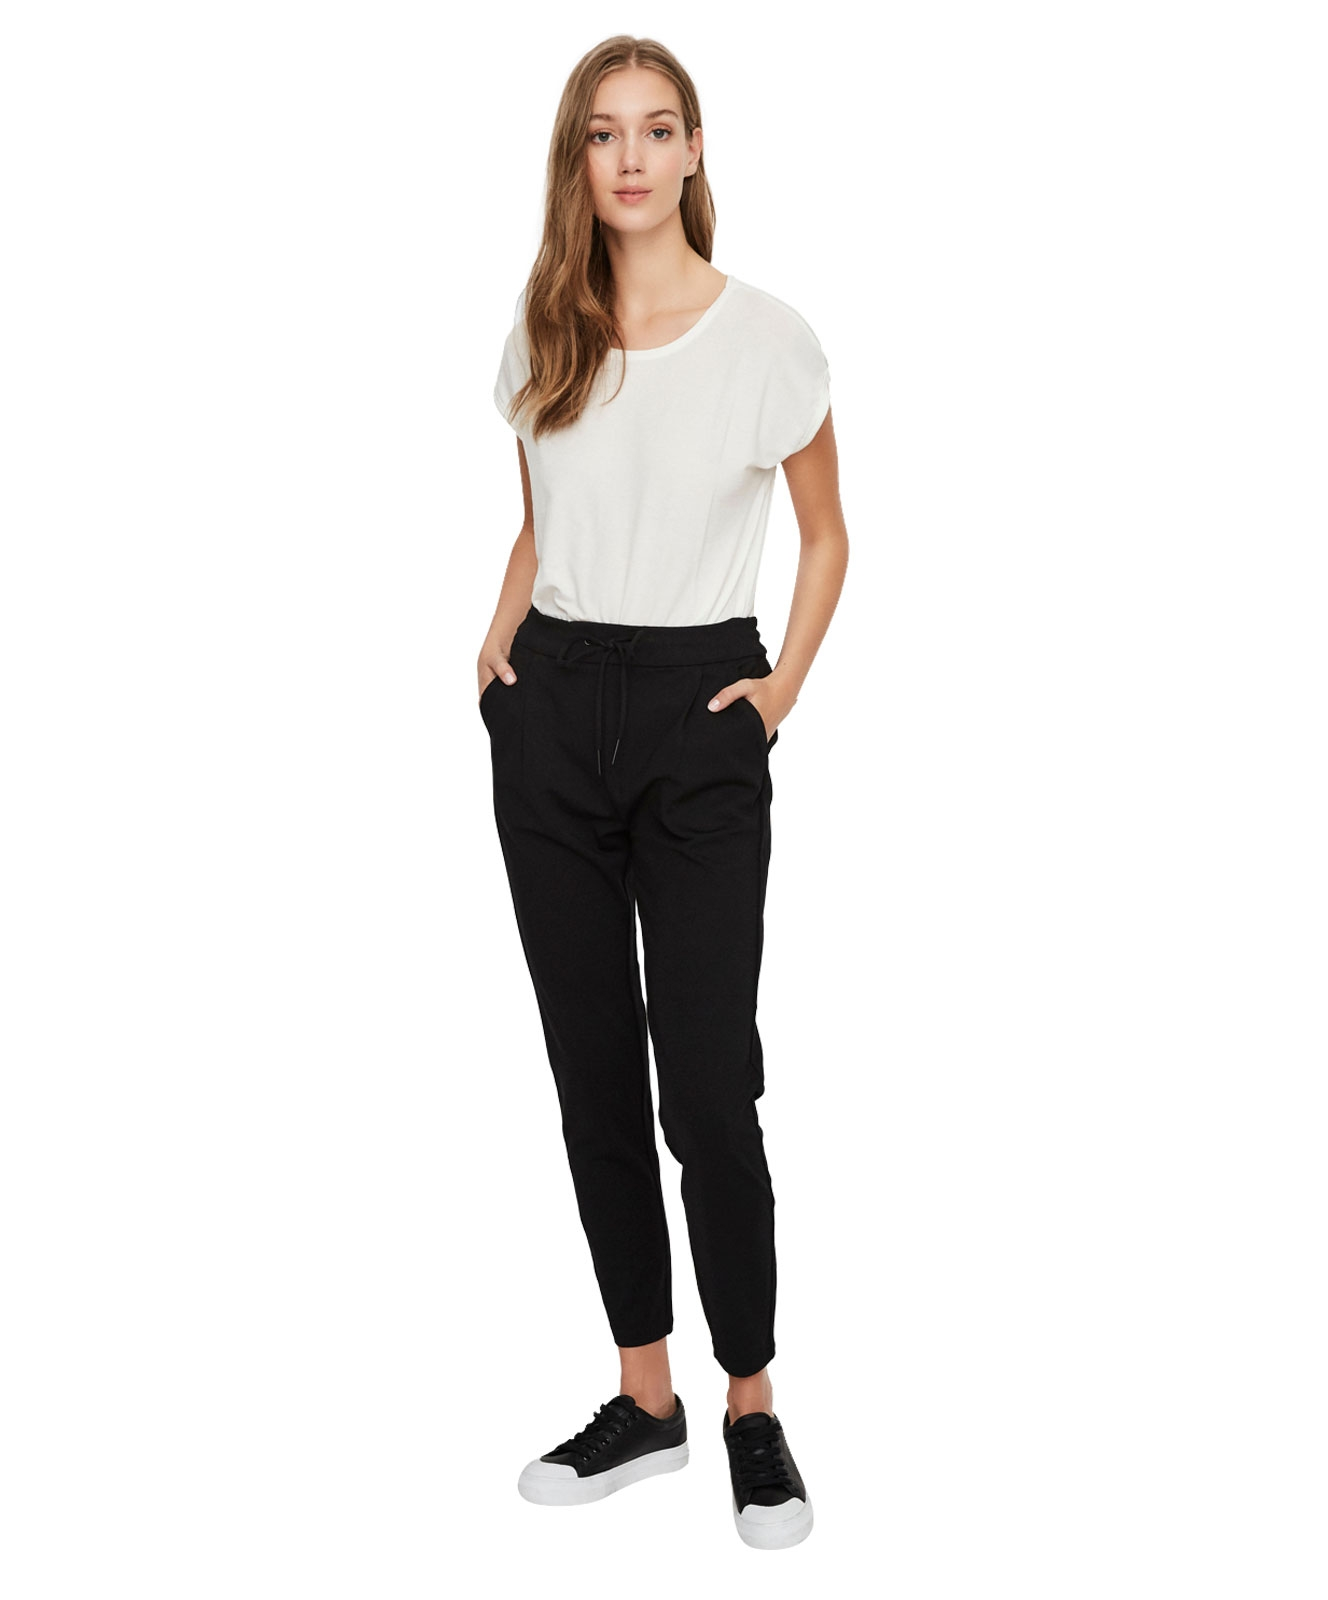 Hosen - Vero Moda Stoffhose EVA in Black  - Onlineshop Jeans Meile